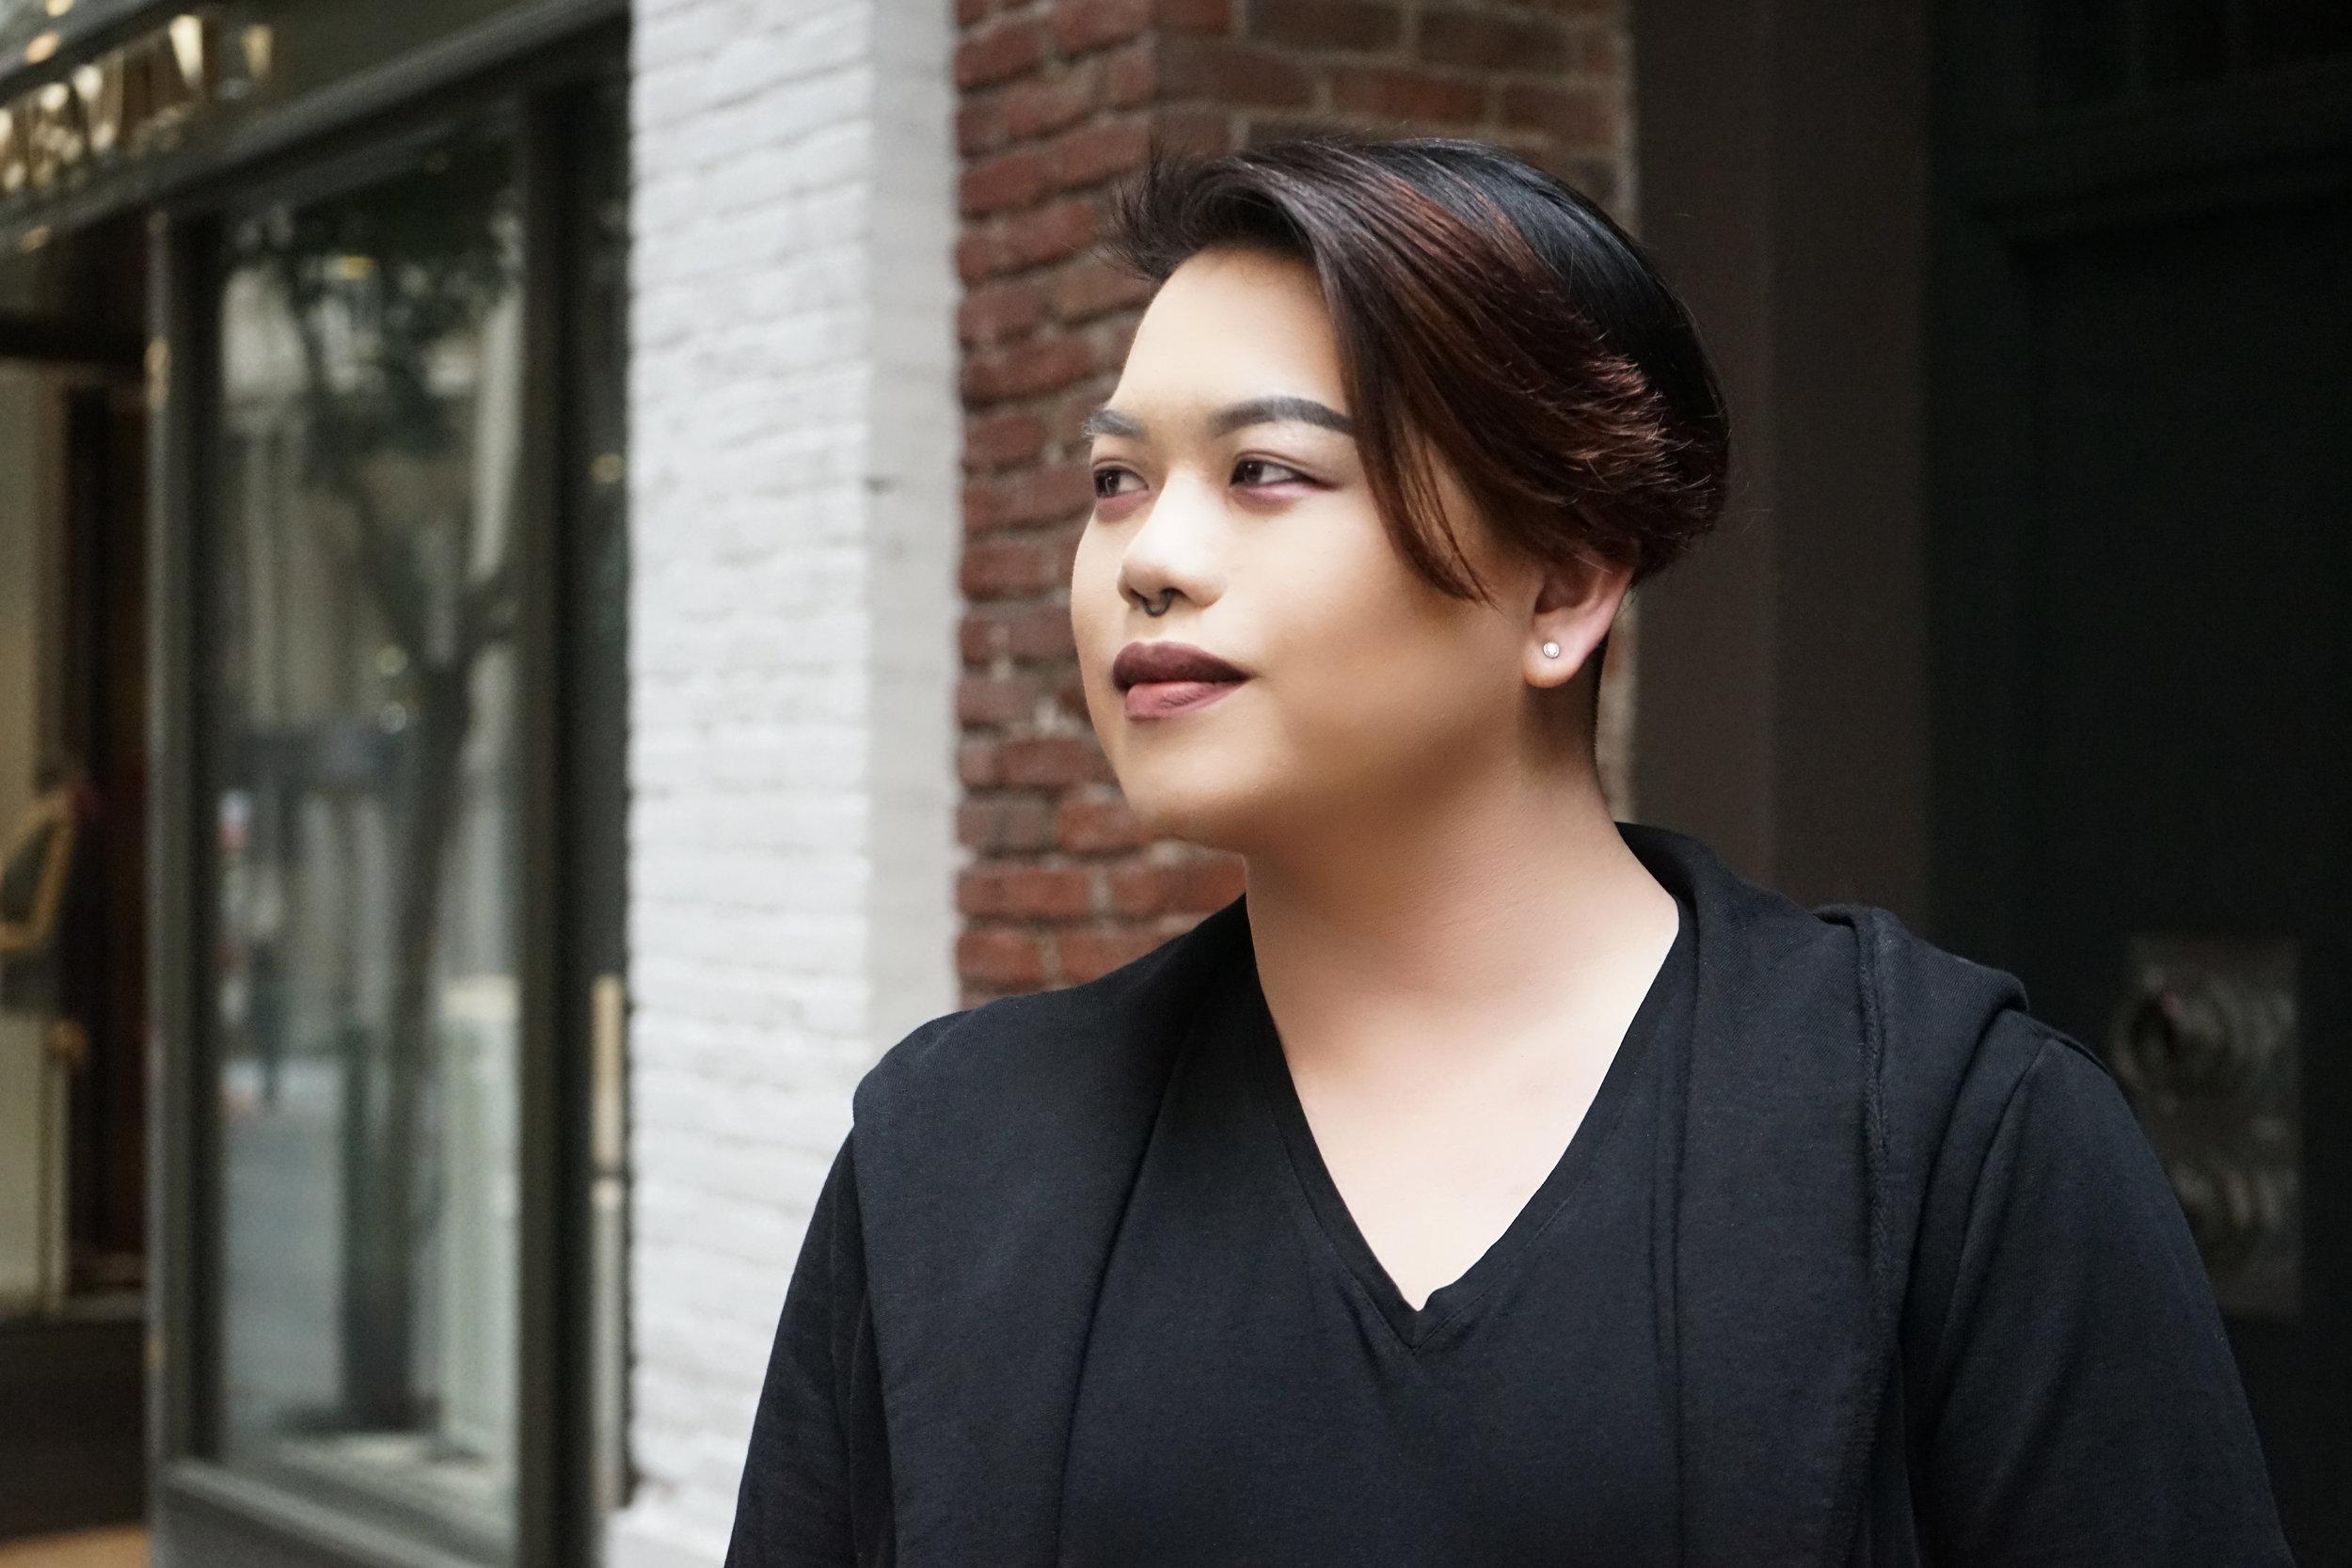 Assistant and tech Jonathan Ng